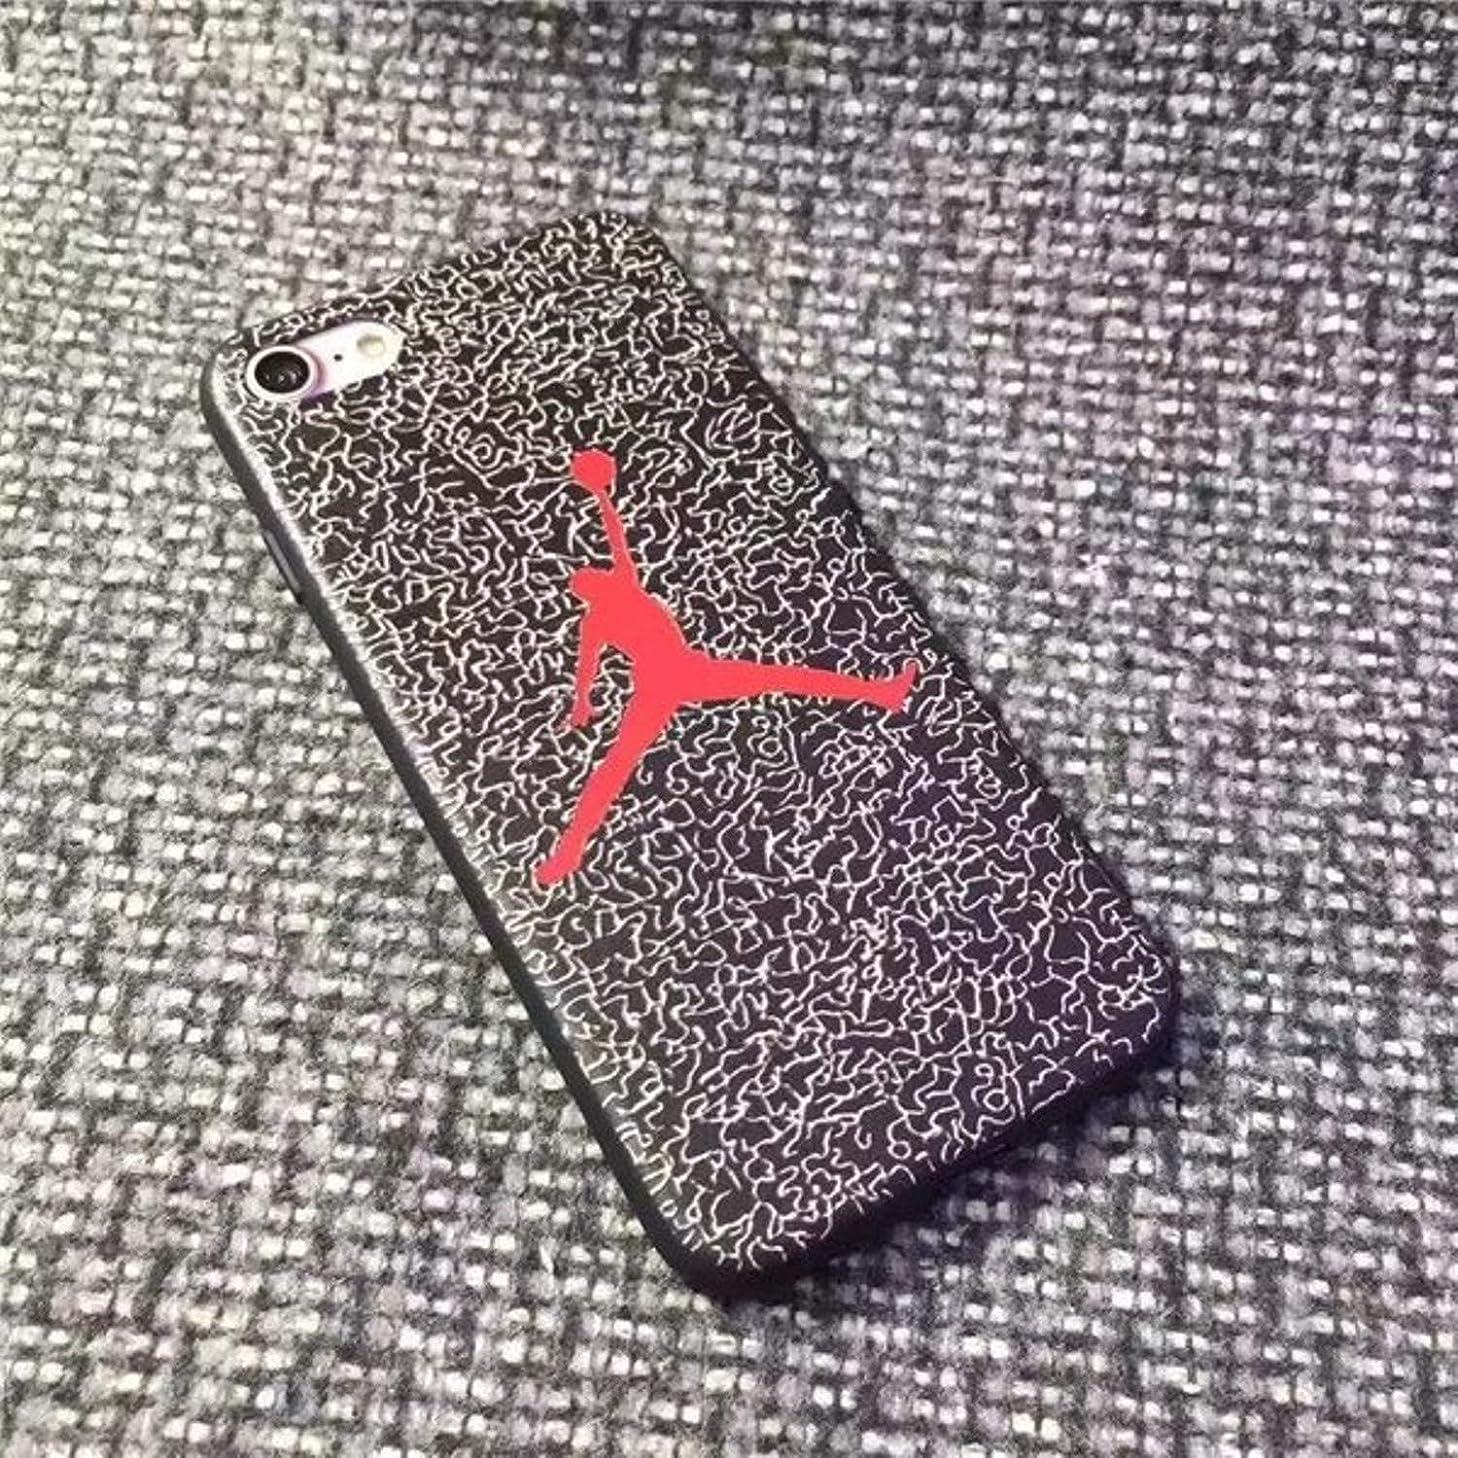 Best Air Jordan Phone Case for iPhone 6 6s 7 8 Plus iPhone X XR XS Max Matte Soft TPU Silicone Cover (for iPhone Xs) (for 7 Plus 8 Plus)